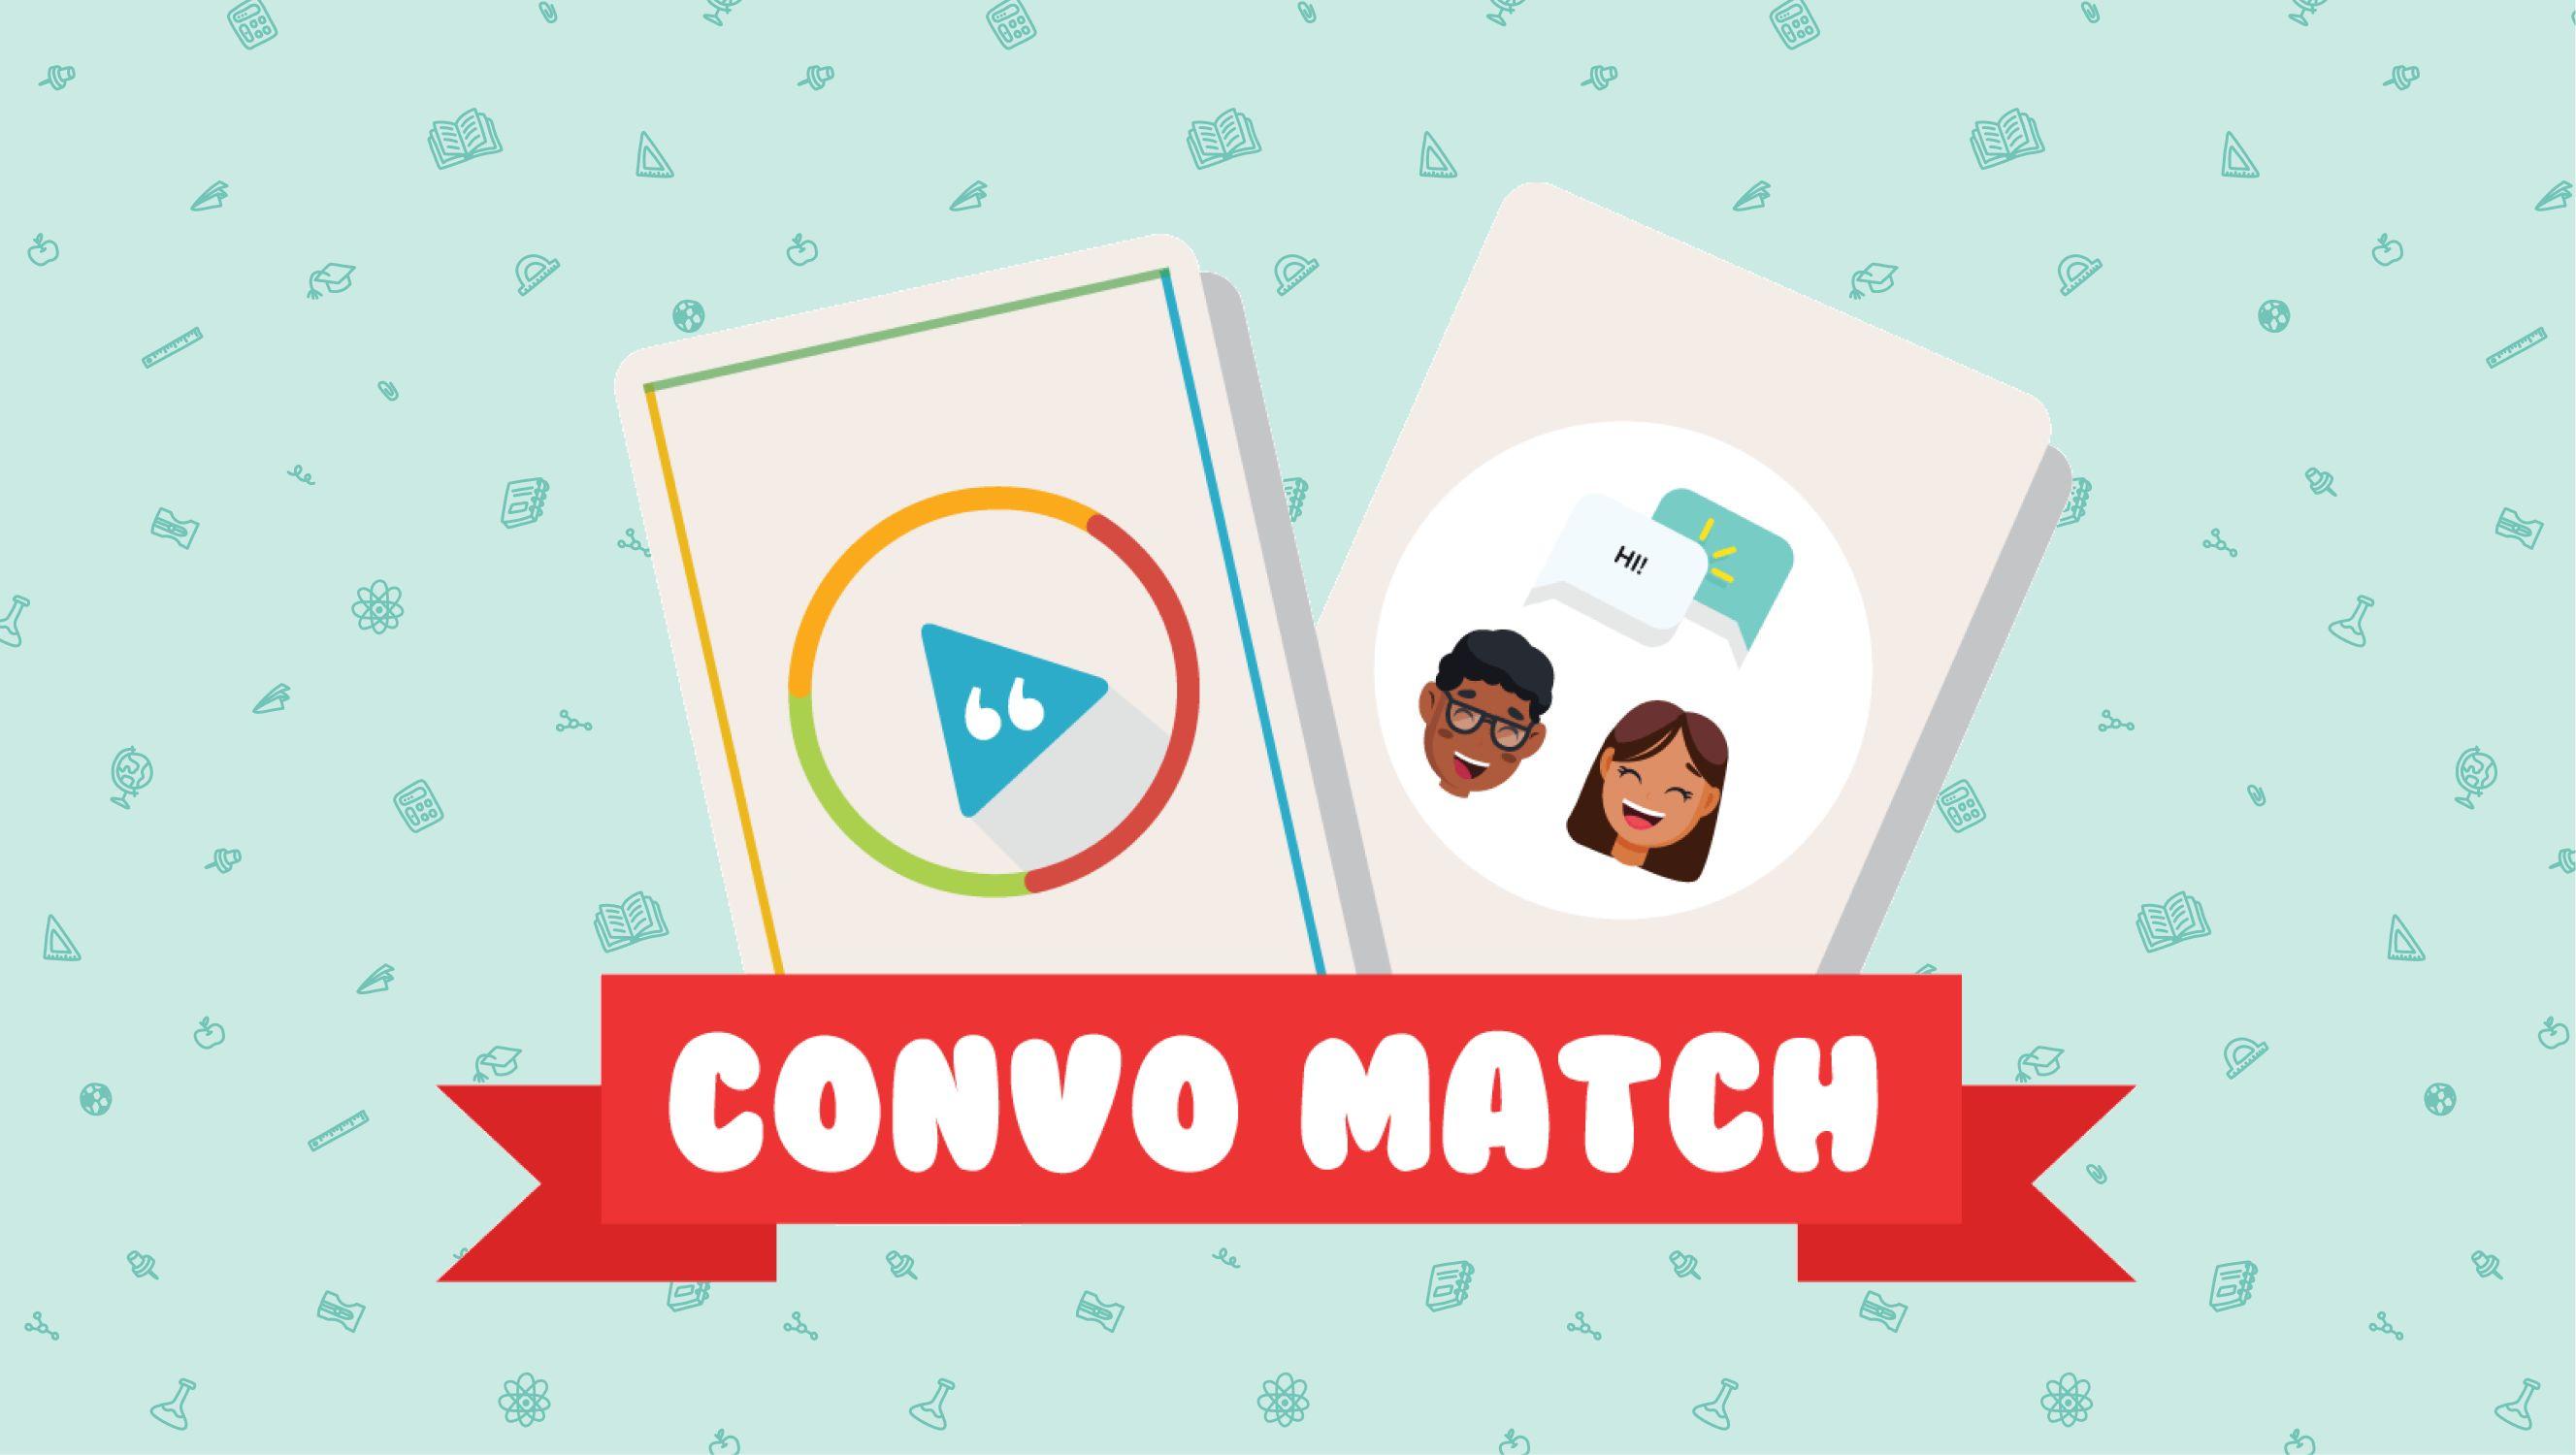 Flip N' Match: Convo Match